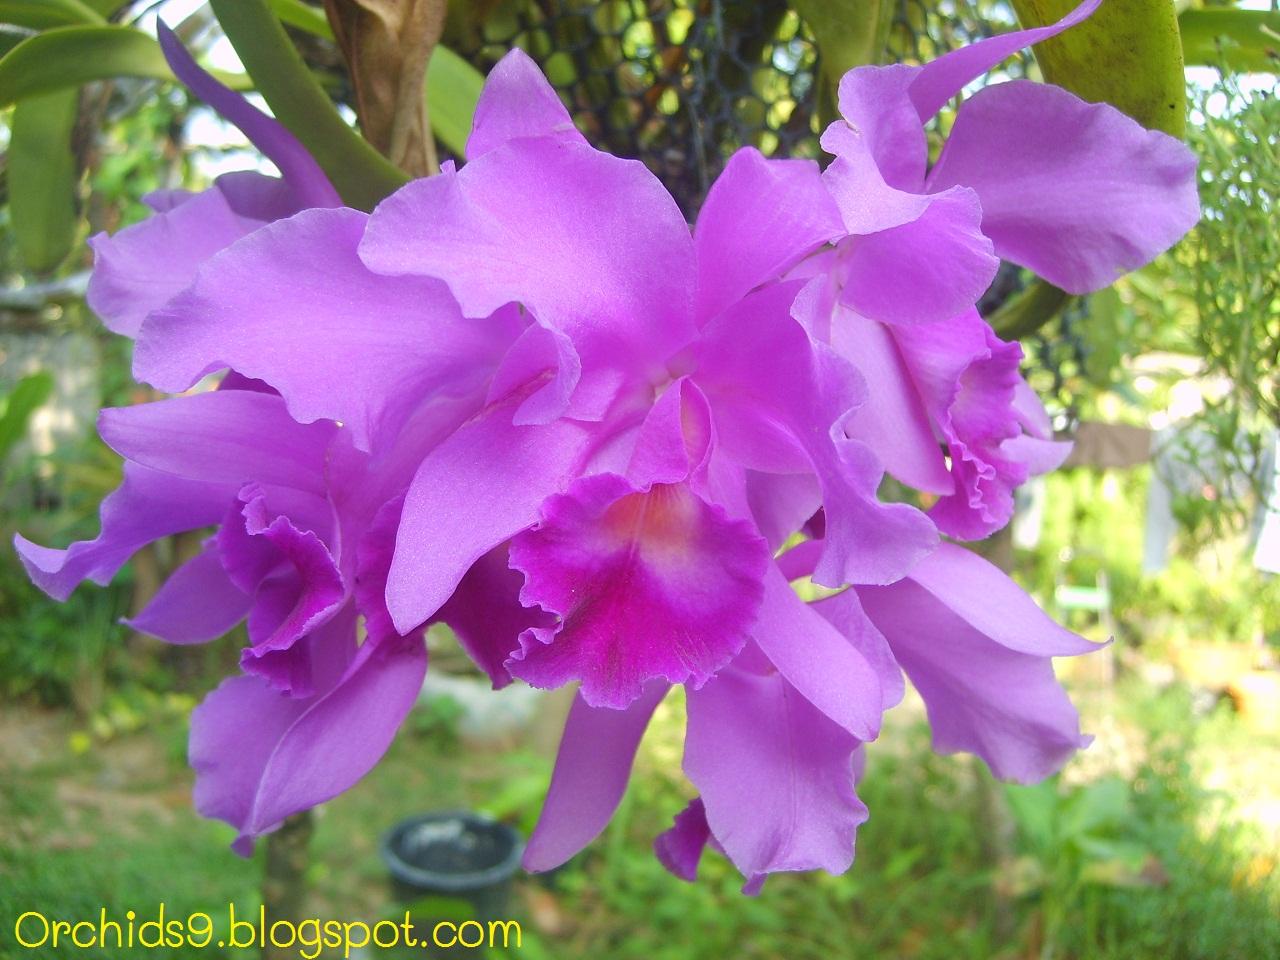 Orchids Flowers Bulbophyllum Vanda Cattleya Cymbidium Phalaenopsis D